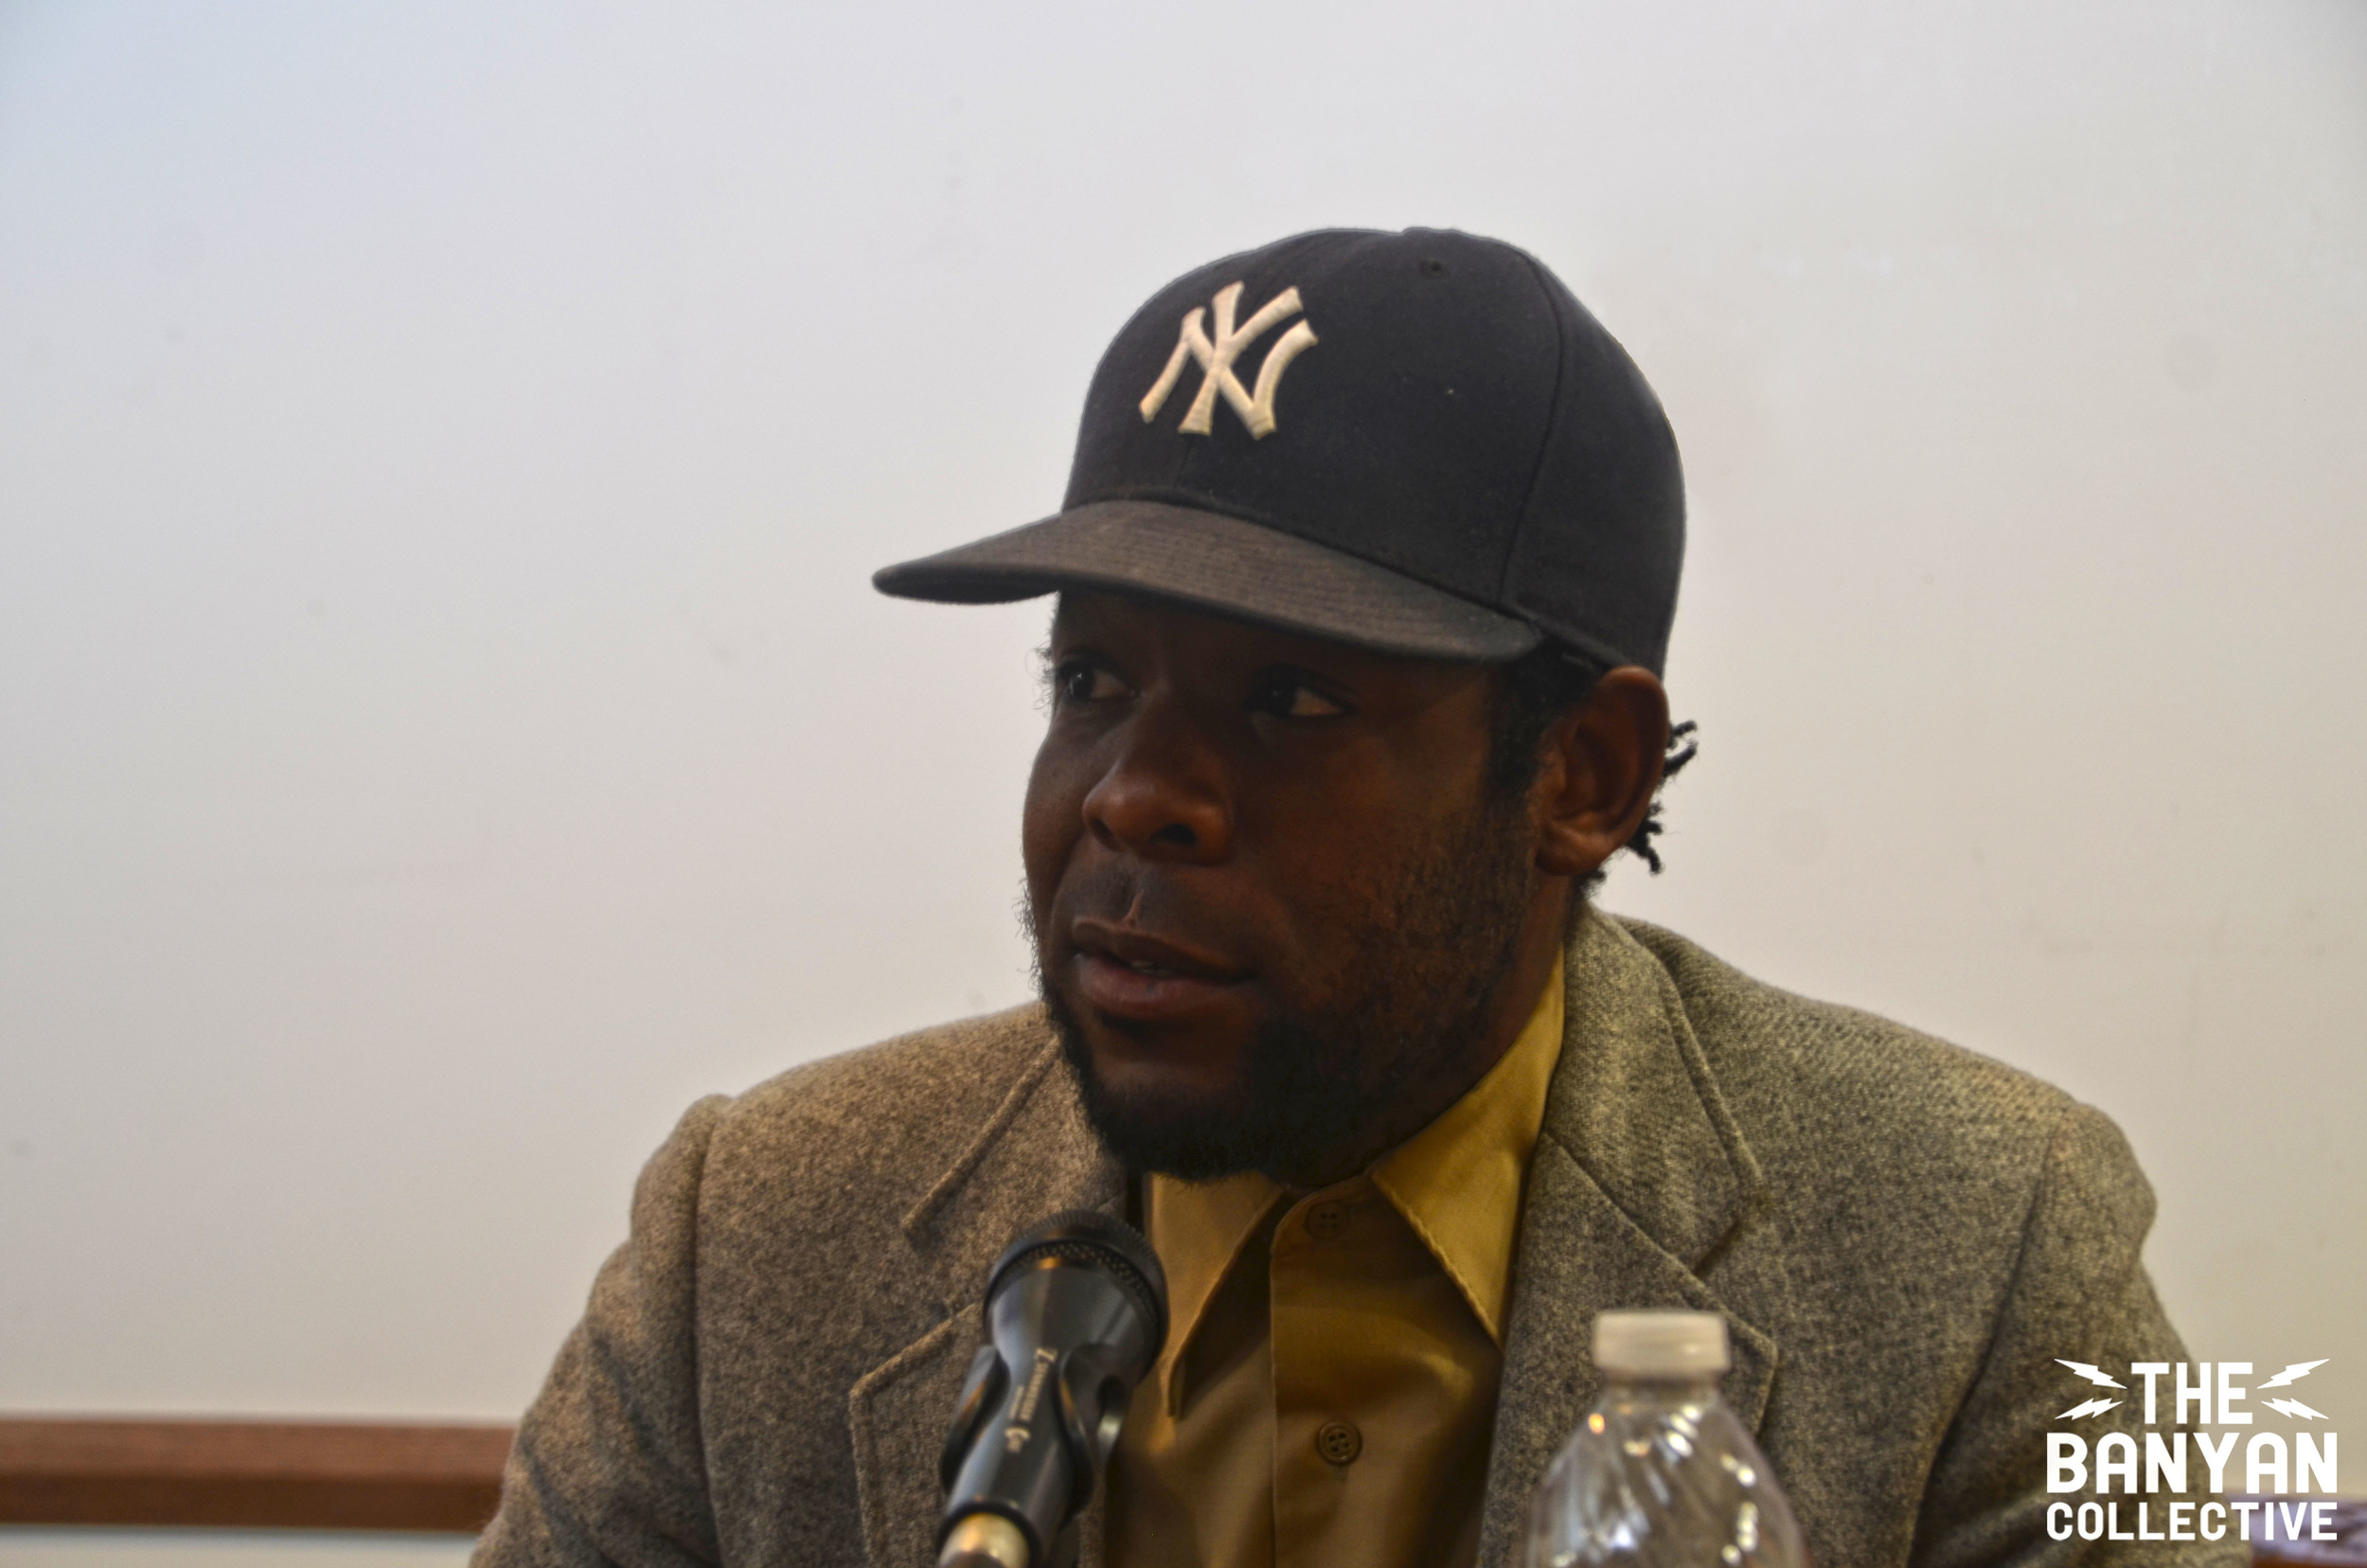 Amir Jackson, Nurture the Creative Mind - Mr. Goodyear's Neighborhood Podcast